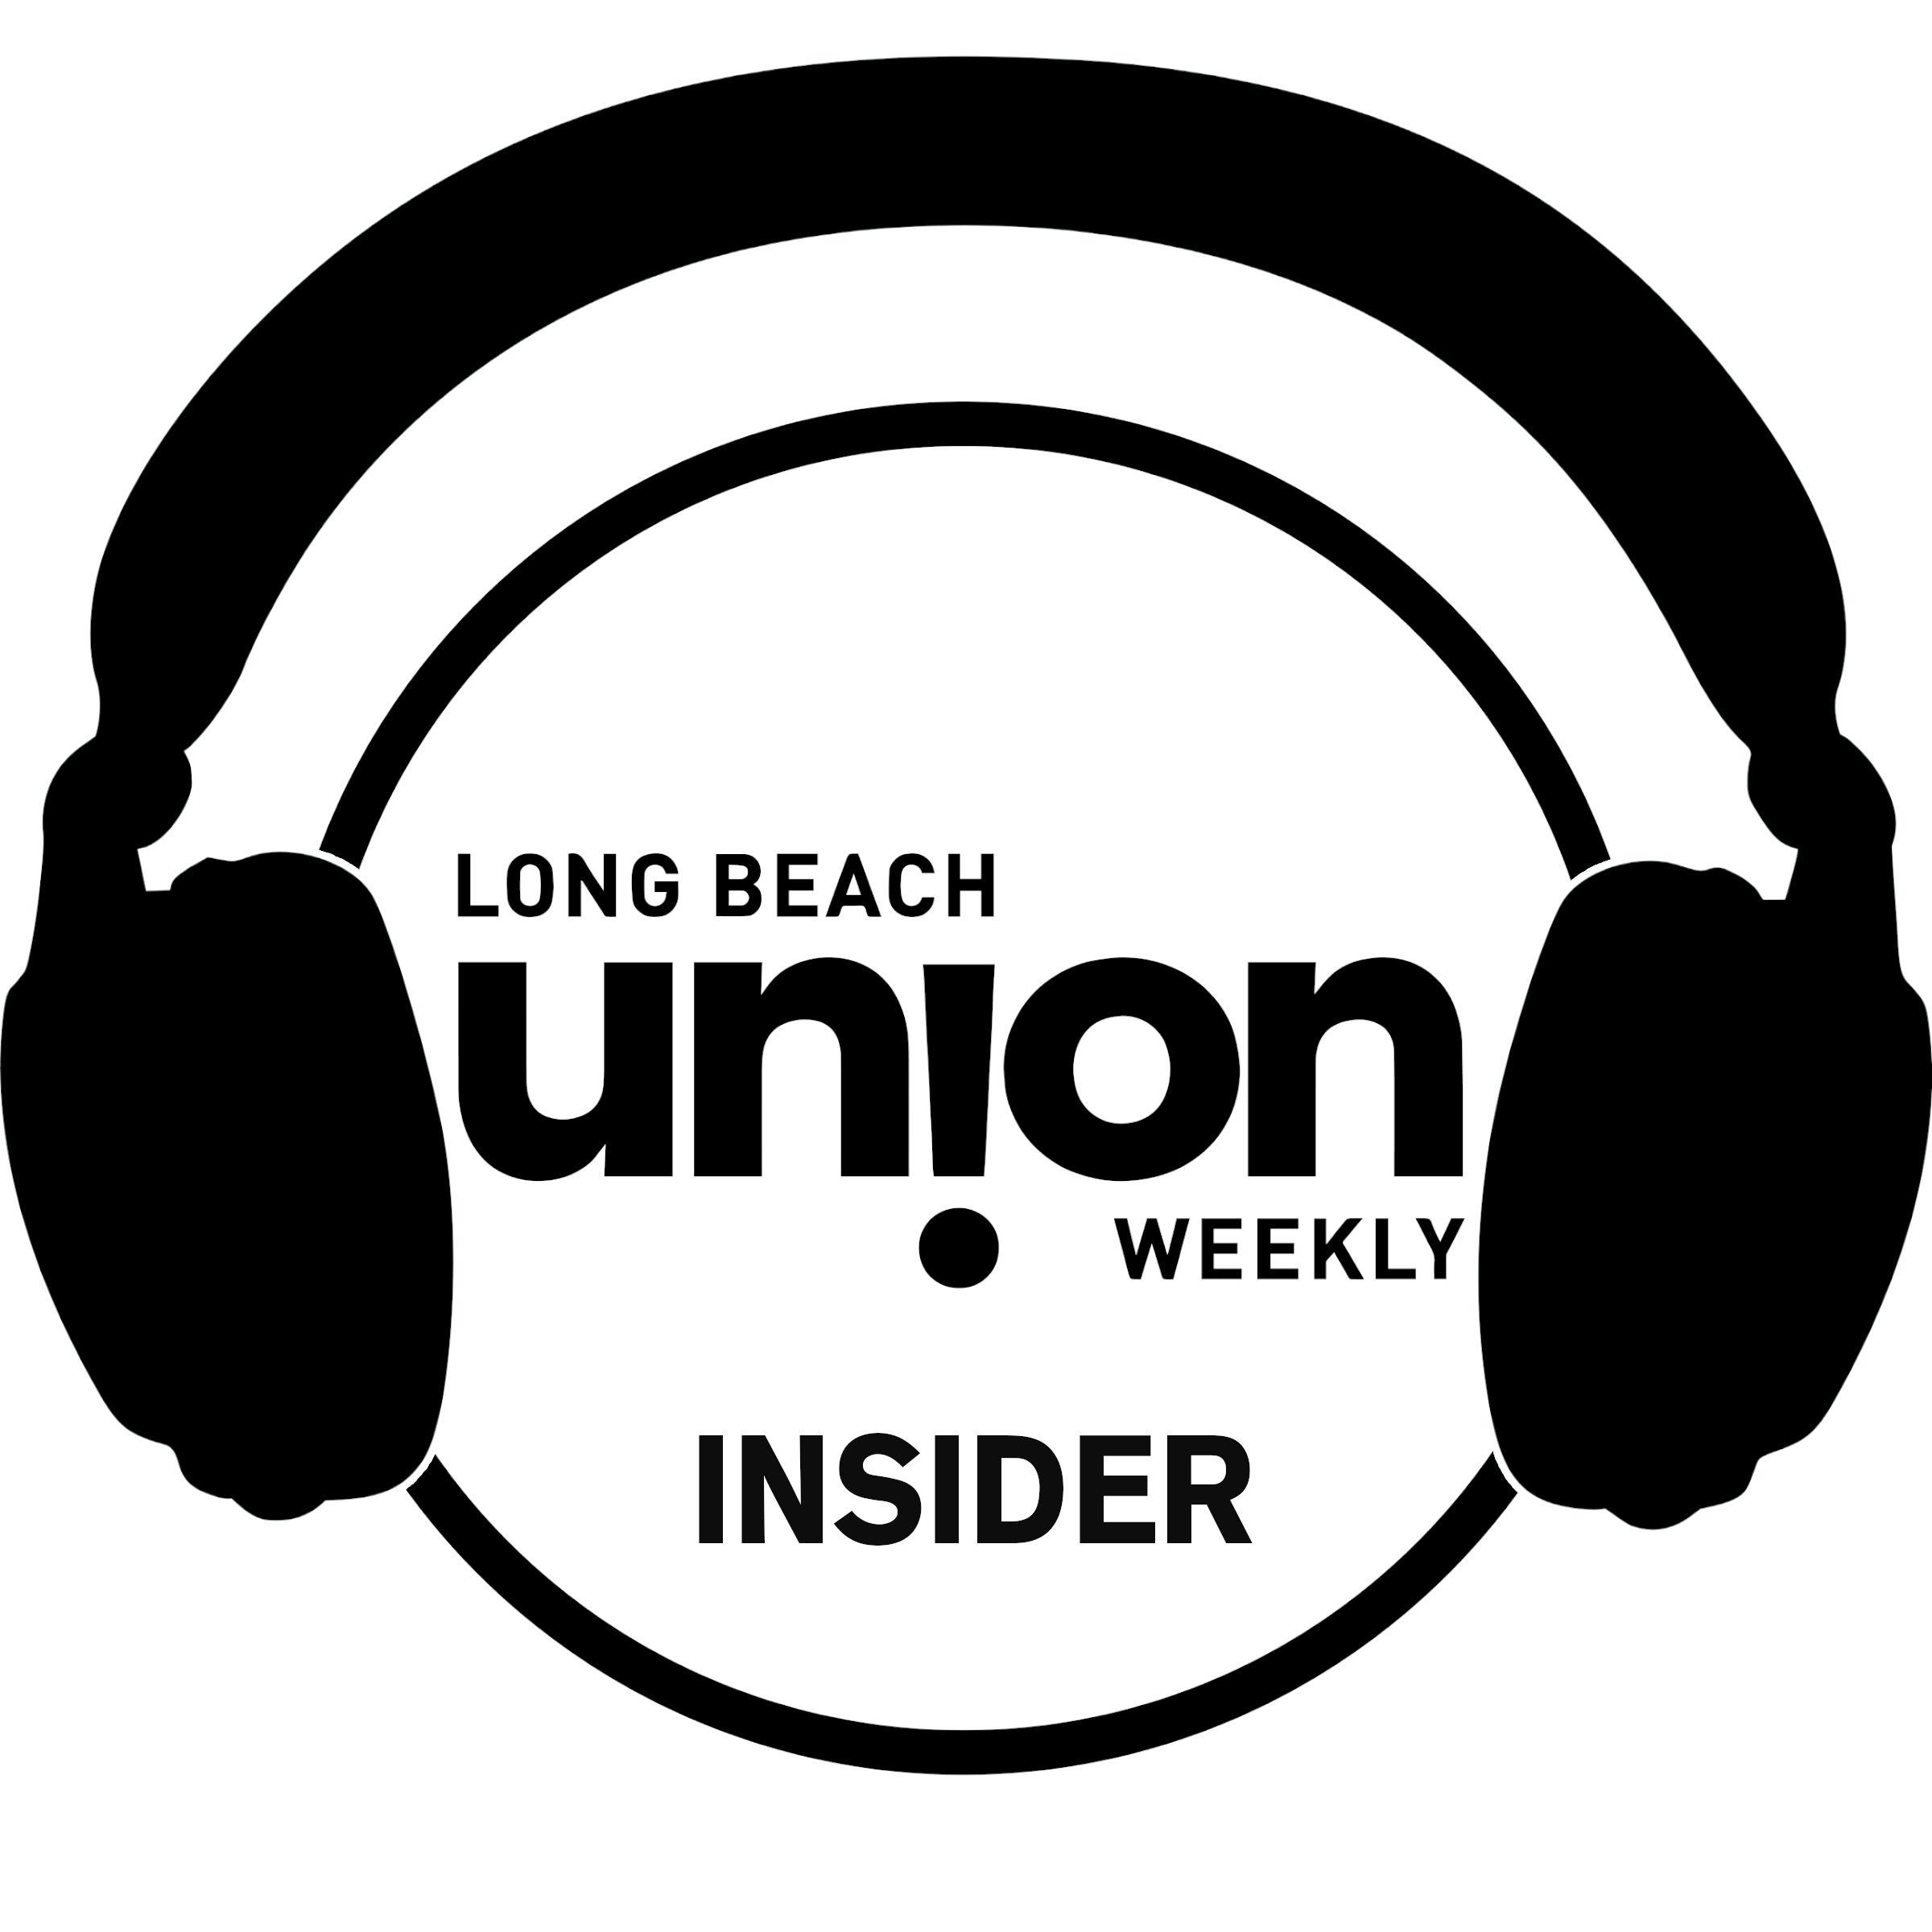 Union Weekly Insider